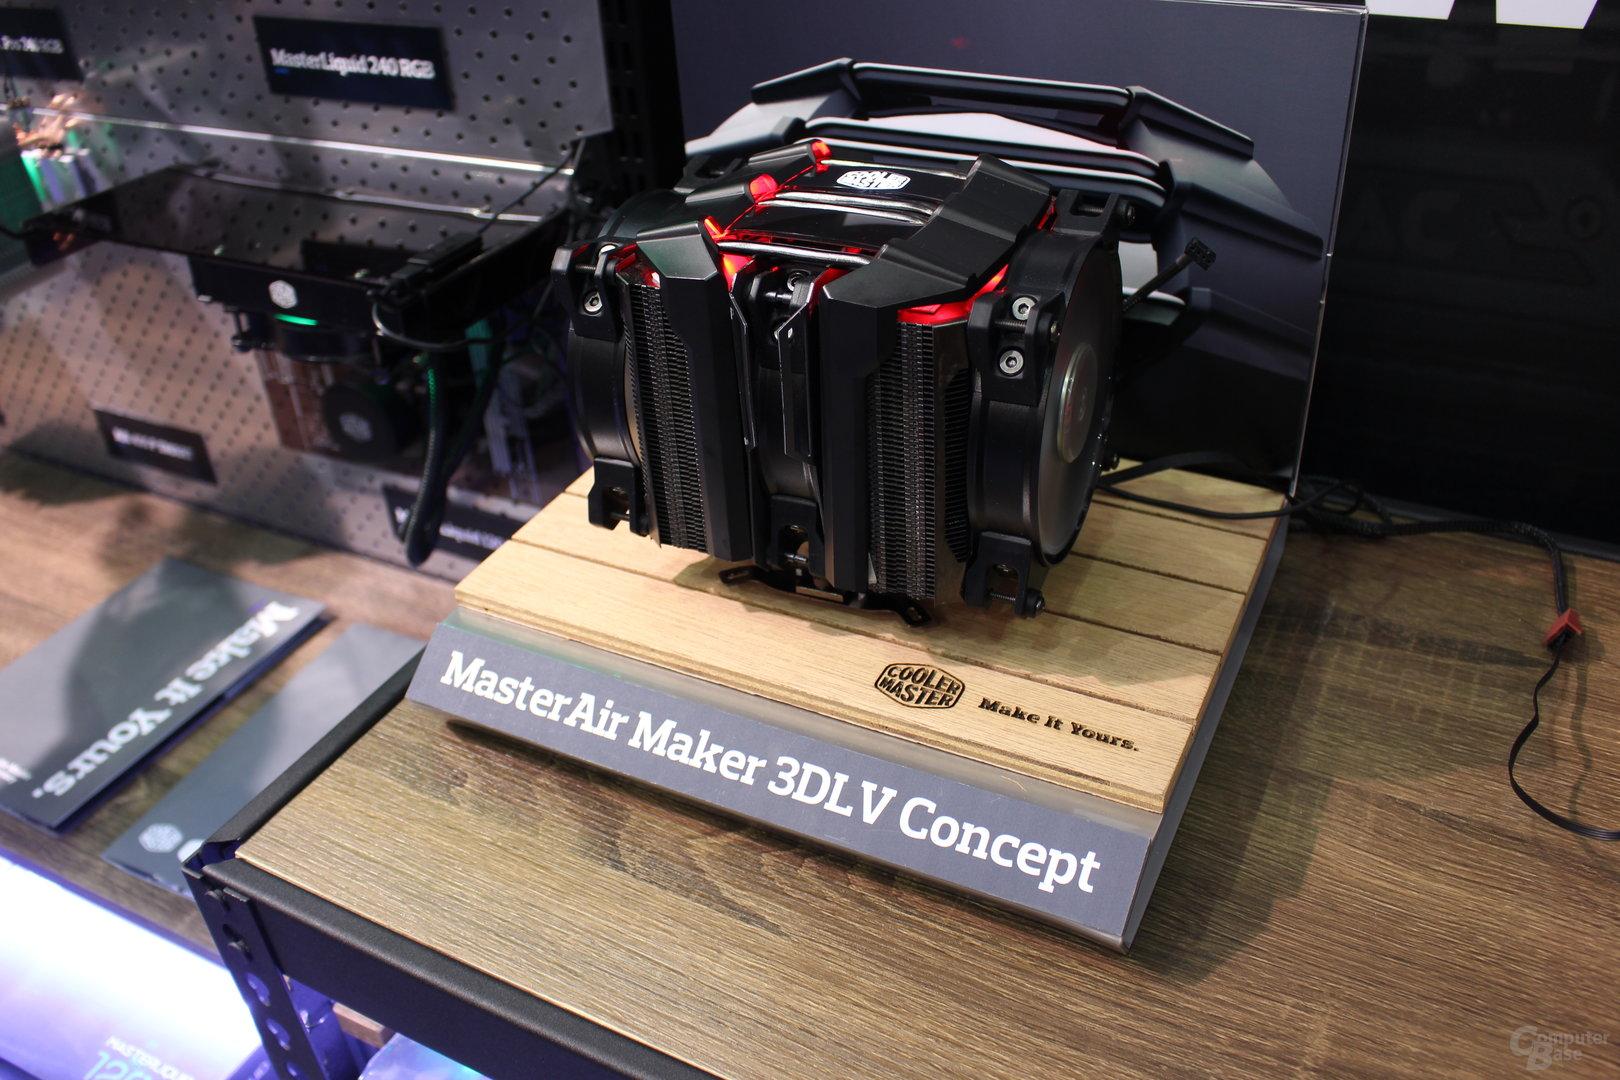 Cooler Master MasterAir Maker 3DLV Concept